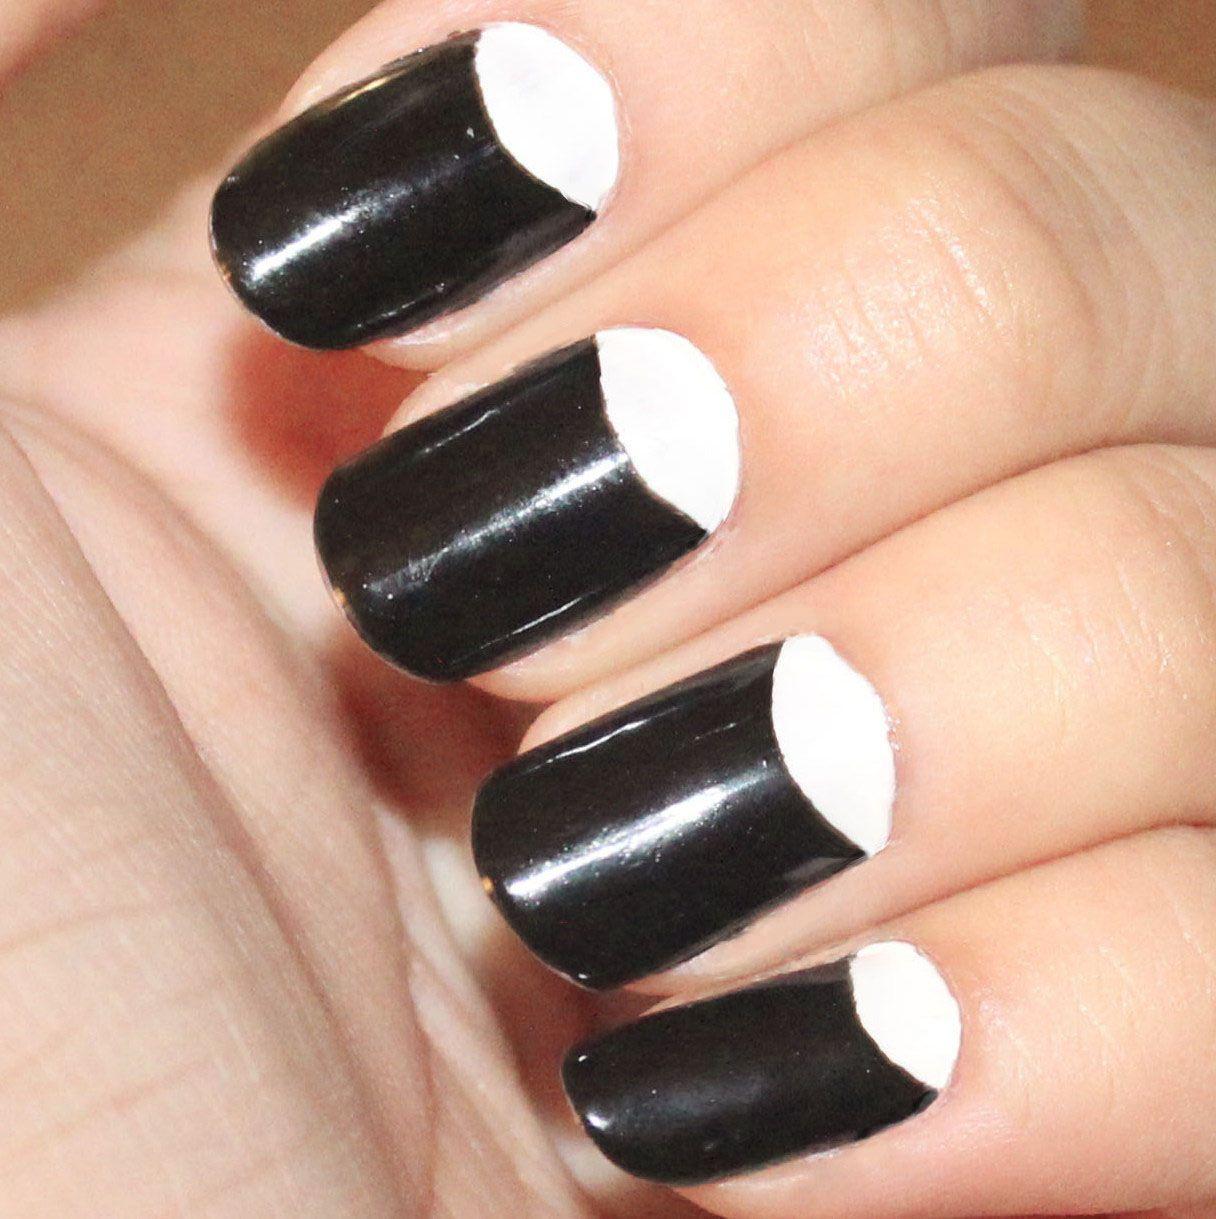 Pretty Half Moon Nail Designs 2015 Black-and-White-Half - Pretty Nails To Try: Half Moon Nail Designs Moon Nails